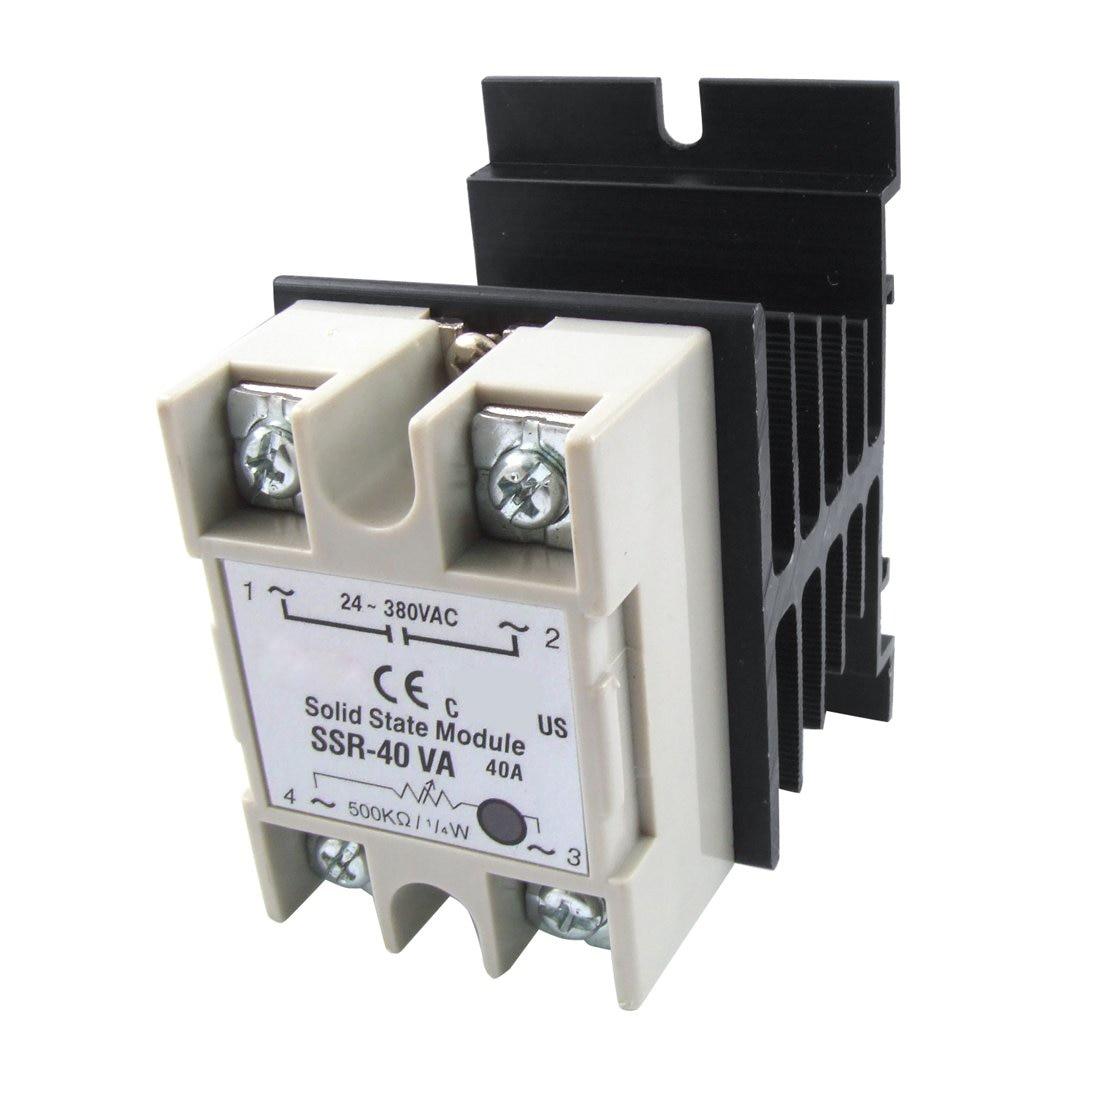 DHDL- VolTage Resistance Regulator Solid State Relay SSR 40A 24-380V AC w Heat SInk 500kohm 2w 24 380vac 40a ssr solid state relay resistance regulator